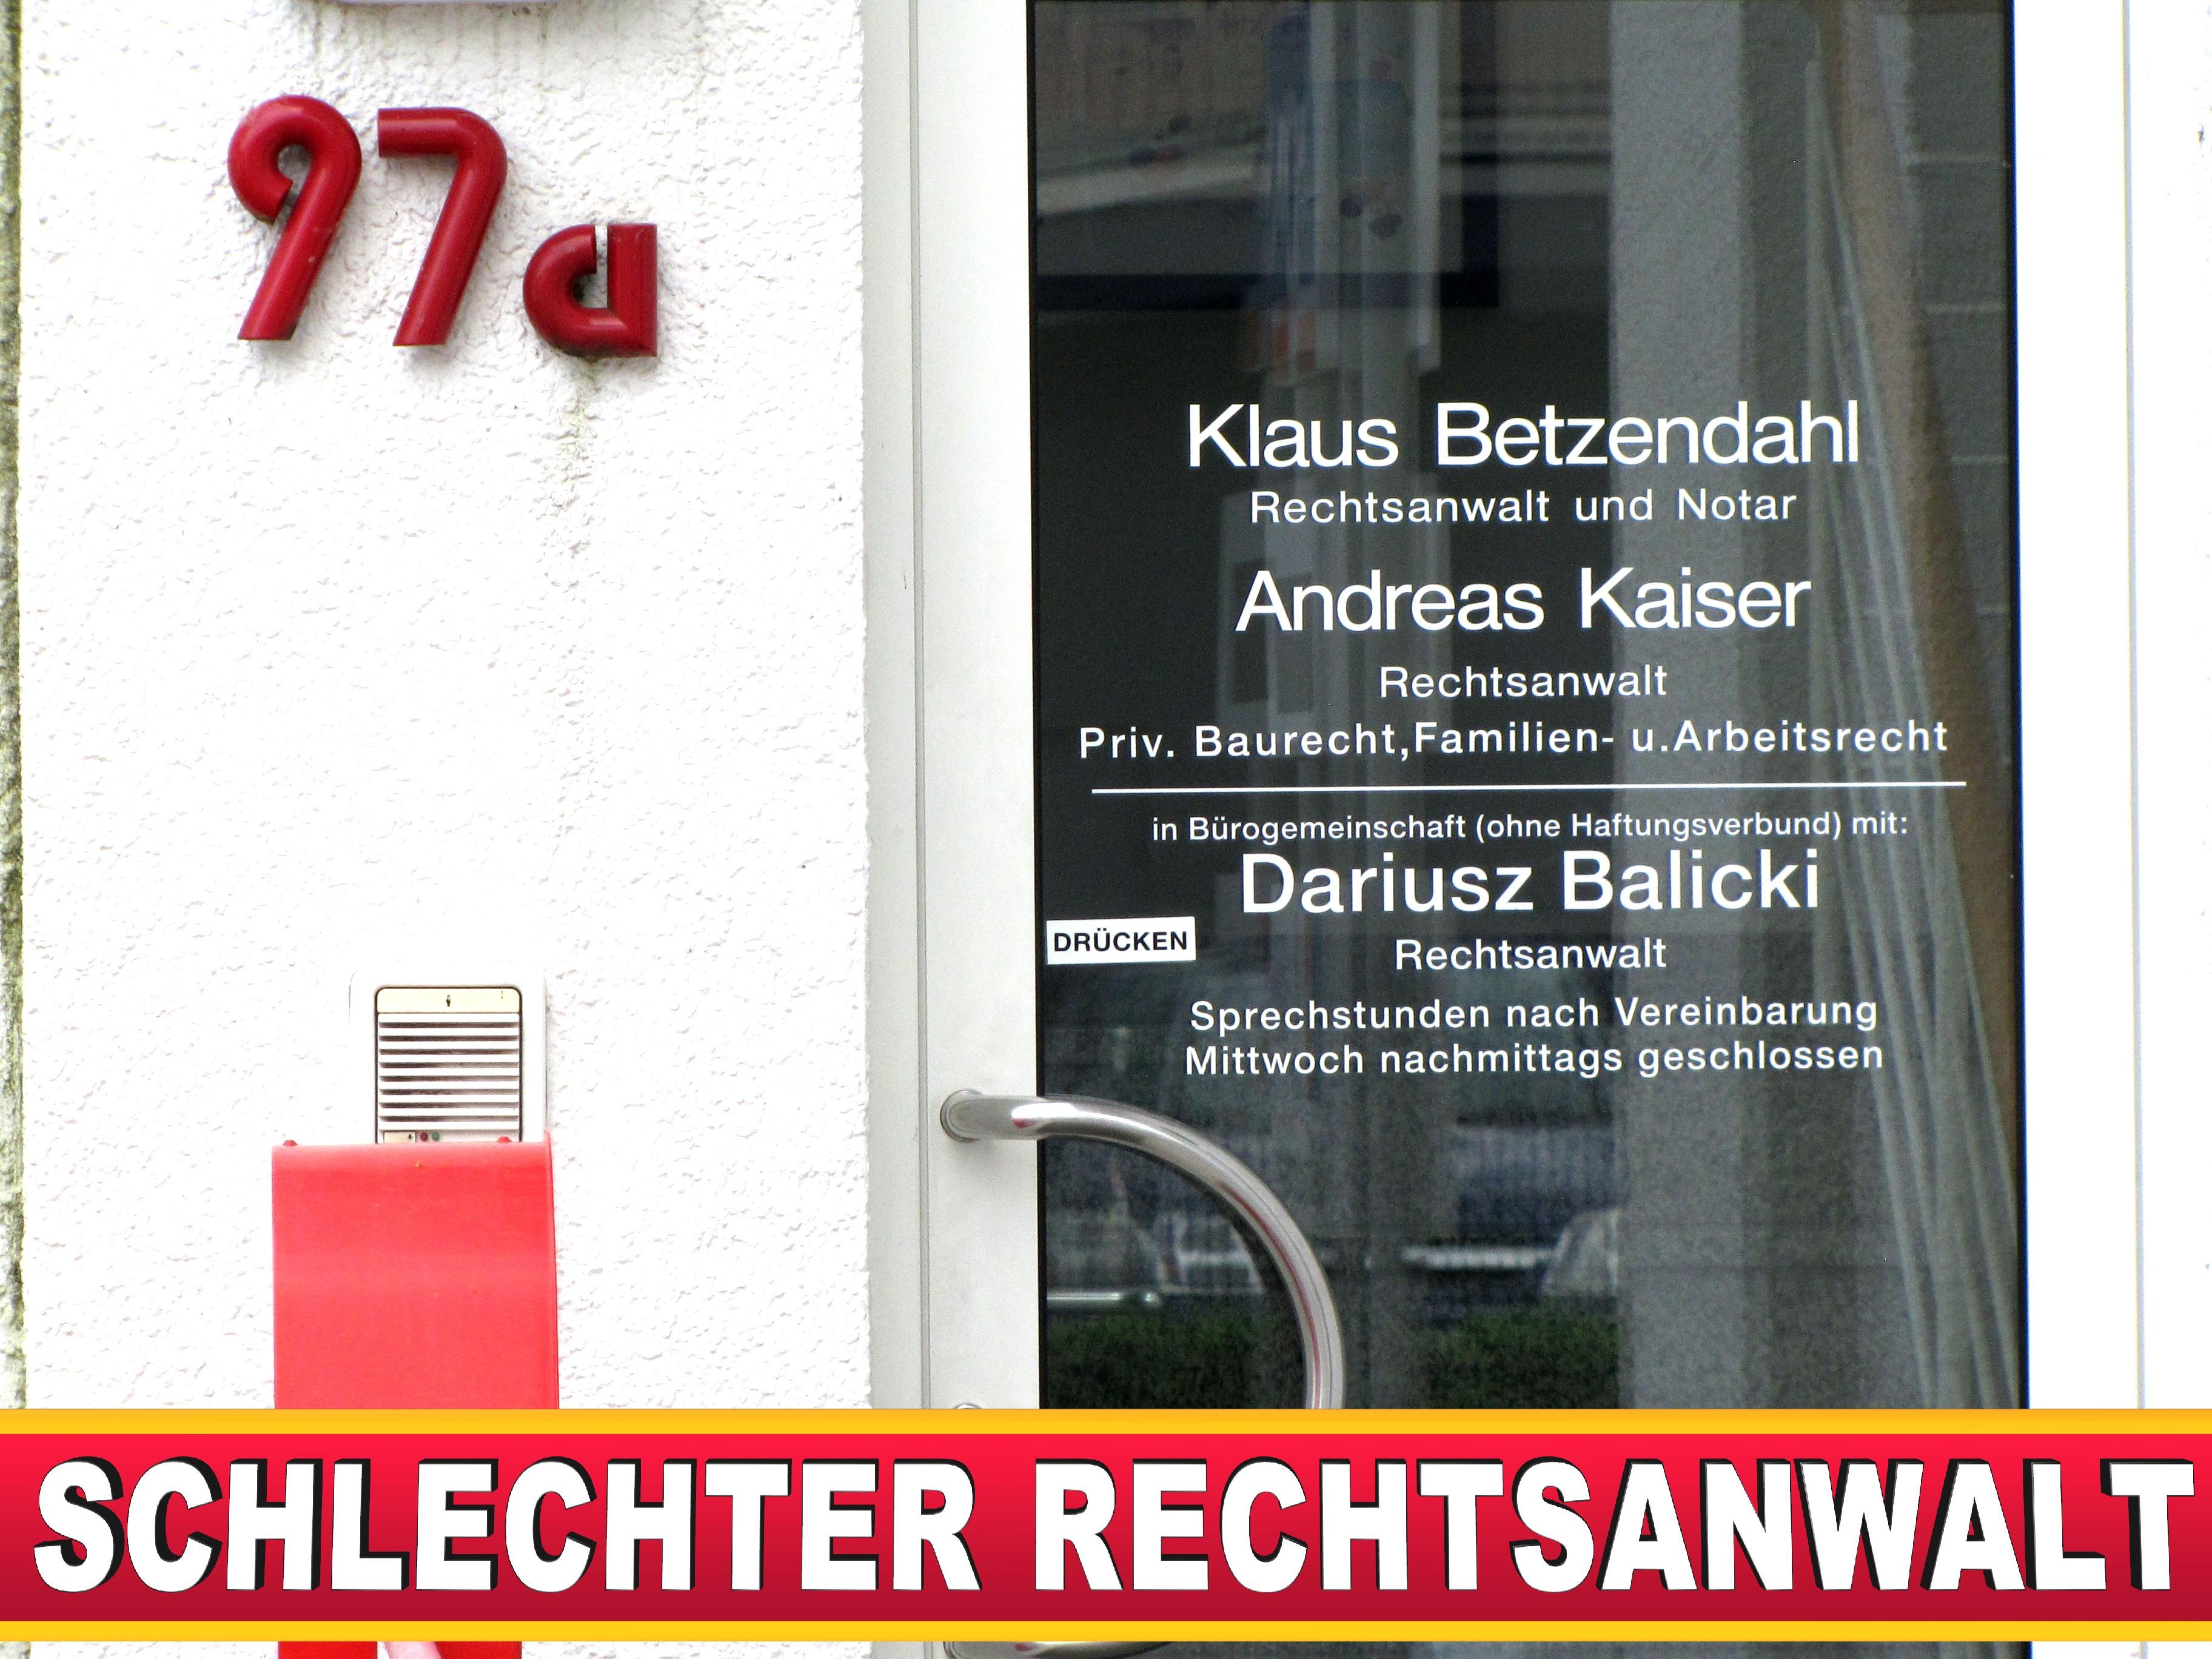 RECHTSANWALT ANDREAS KAISER Carl Severing Straße Bielefeld (11)